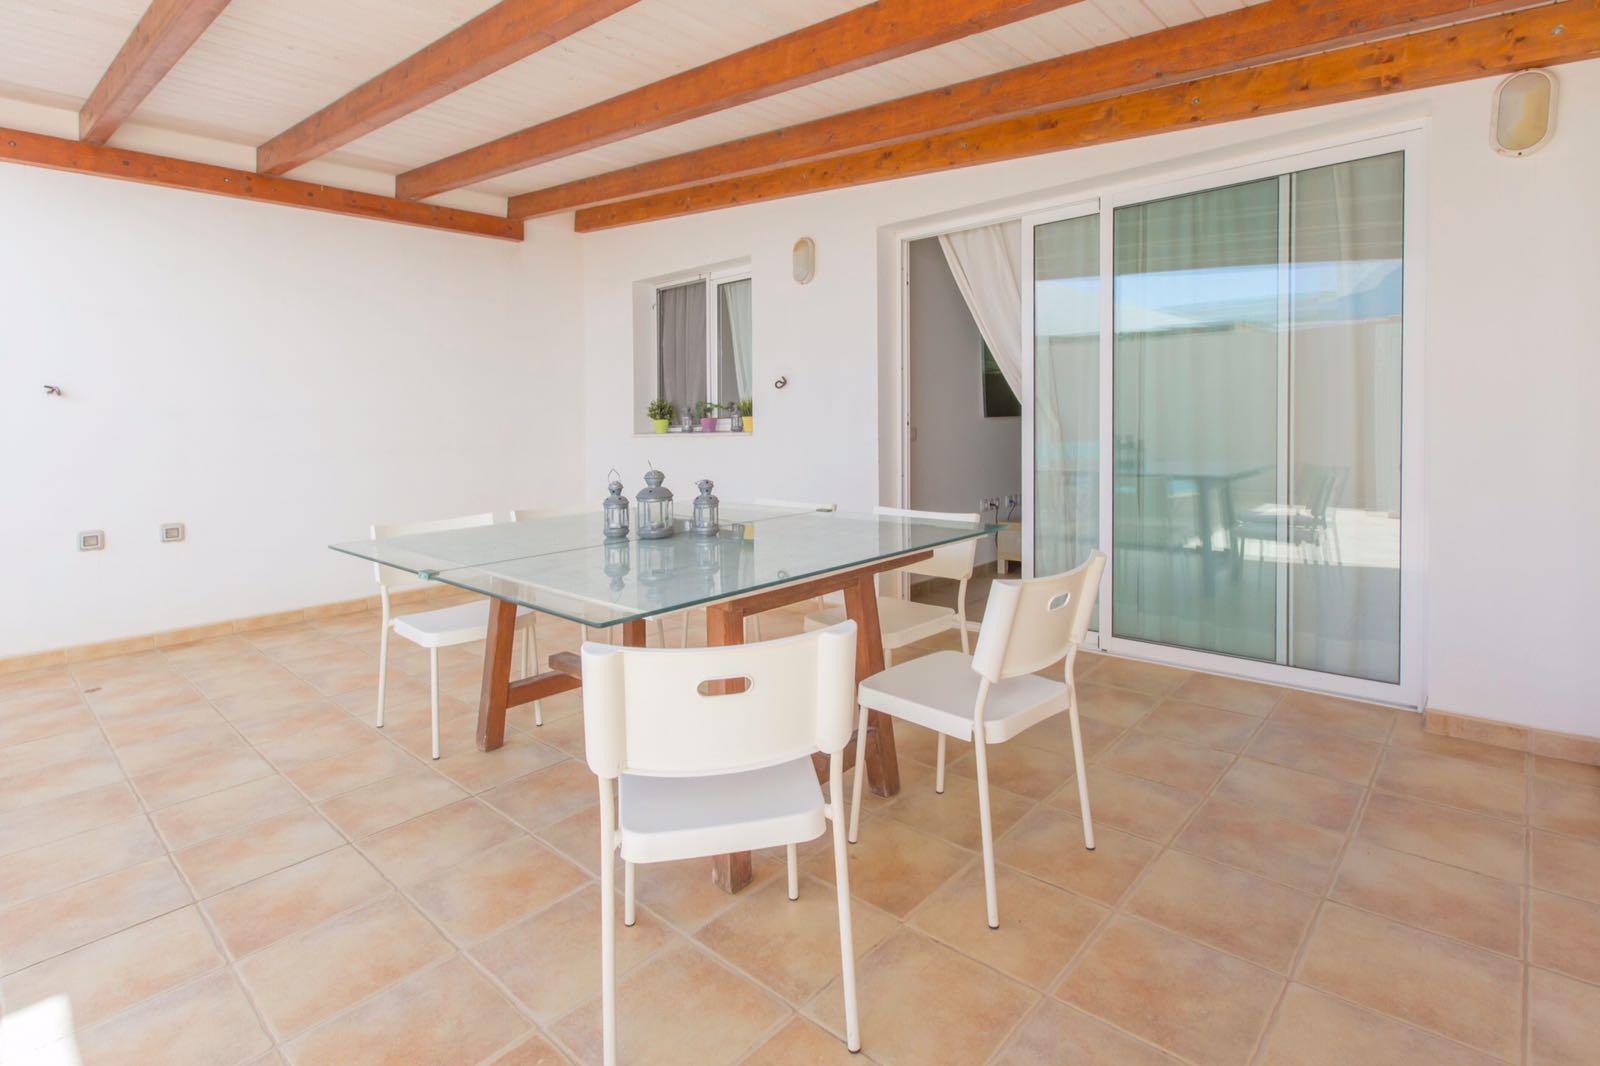 Apartment for Rent in El Cotillo